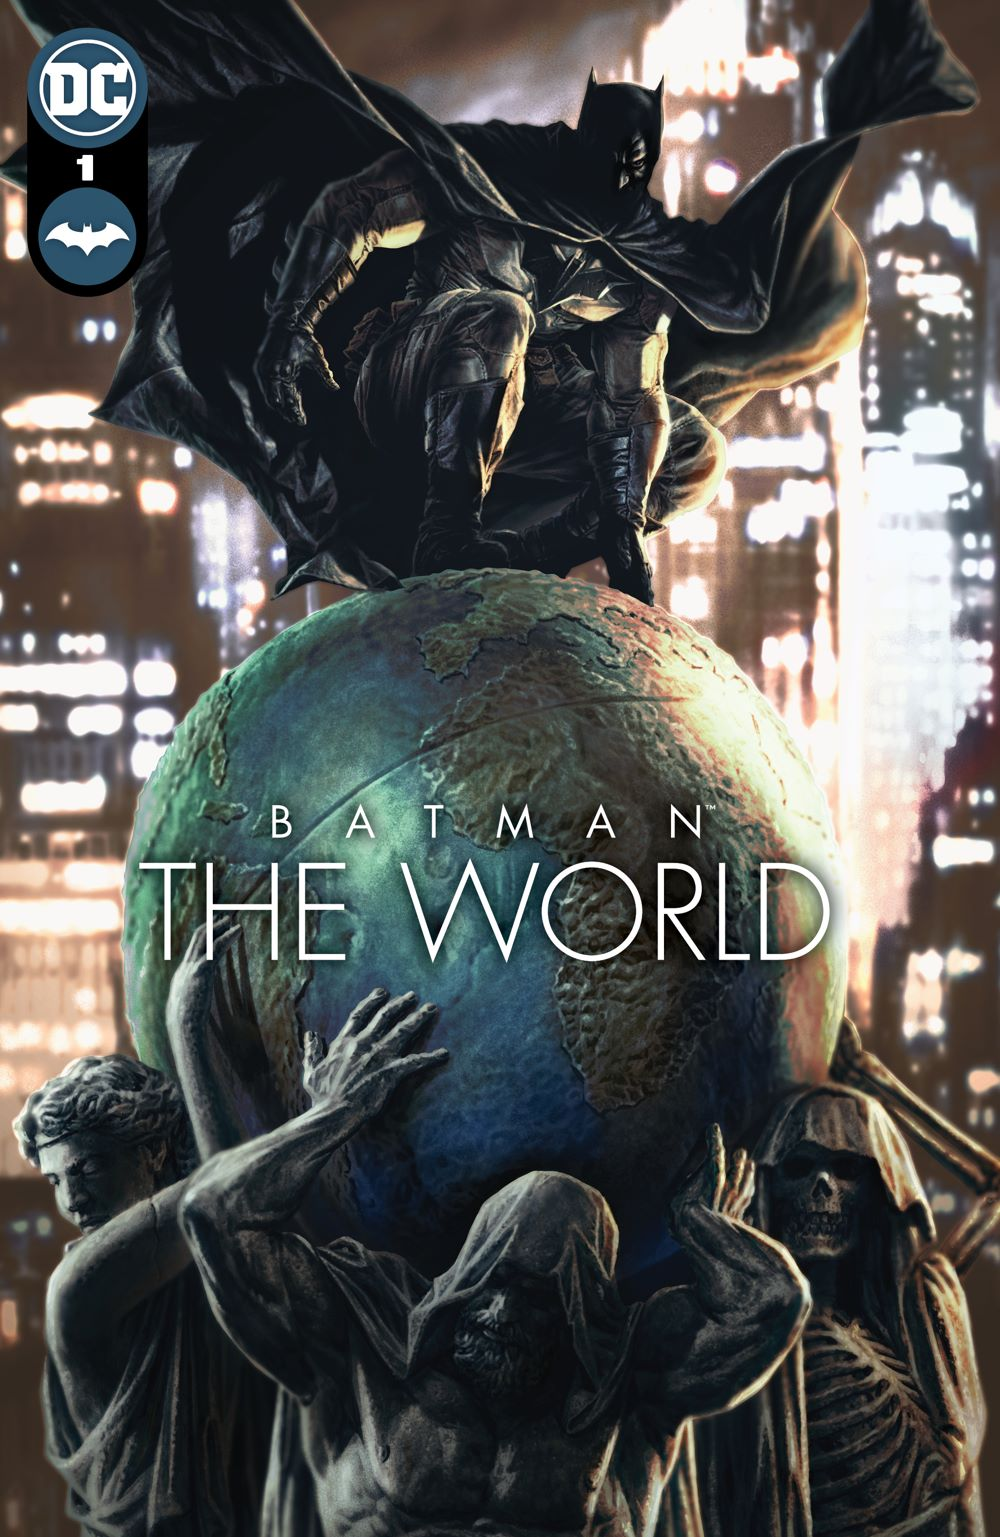 BM_THE_WORLD_Cv1 DC Comics August 2021 Solicitations